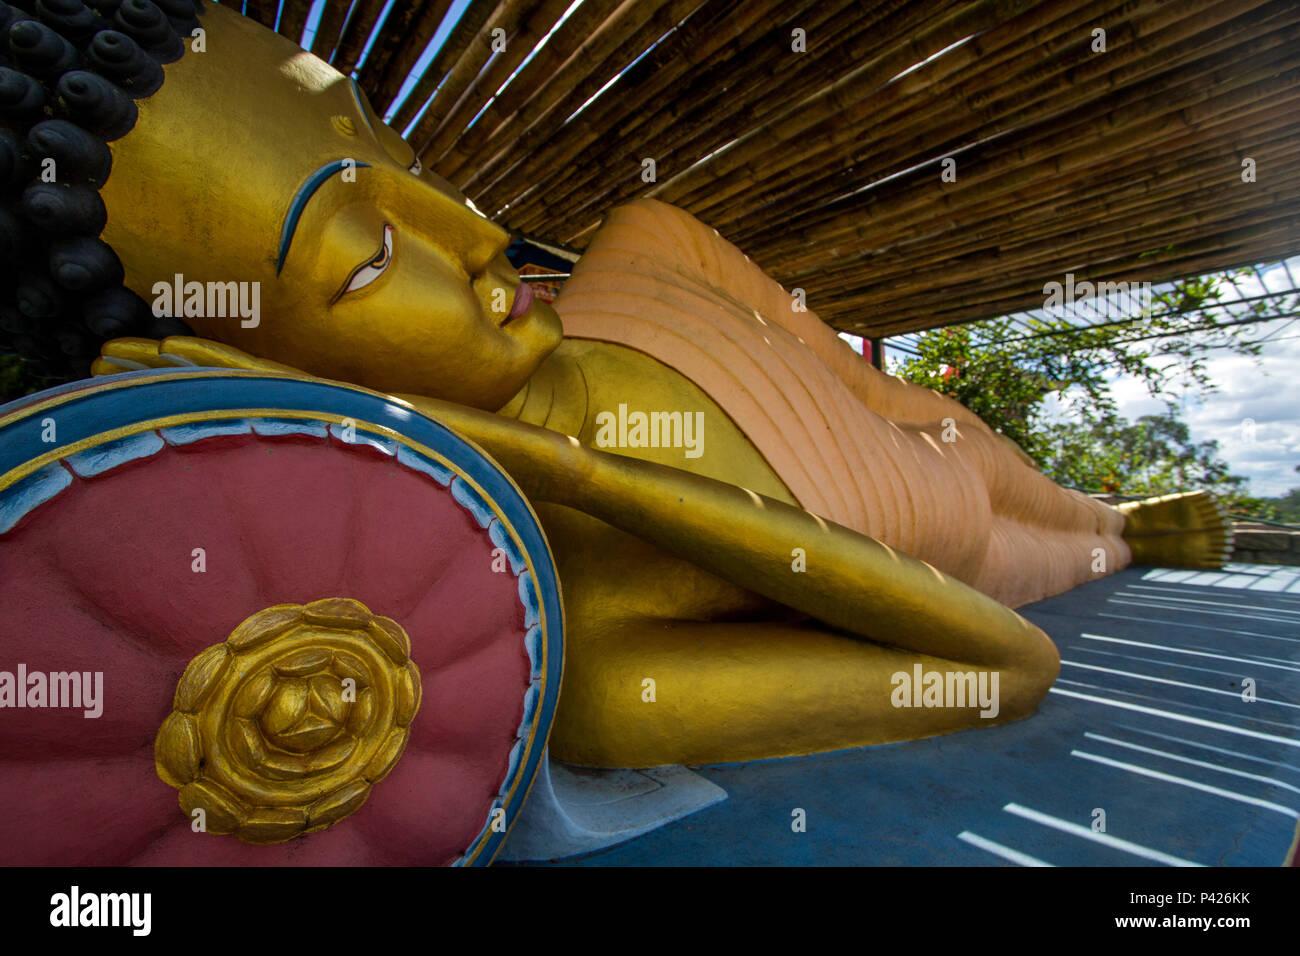 Templo Chagdud Gonpa Odsal Ling, Templo Budista Tibetano, Cotia, São Paulo. Stock Photo